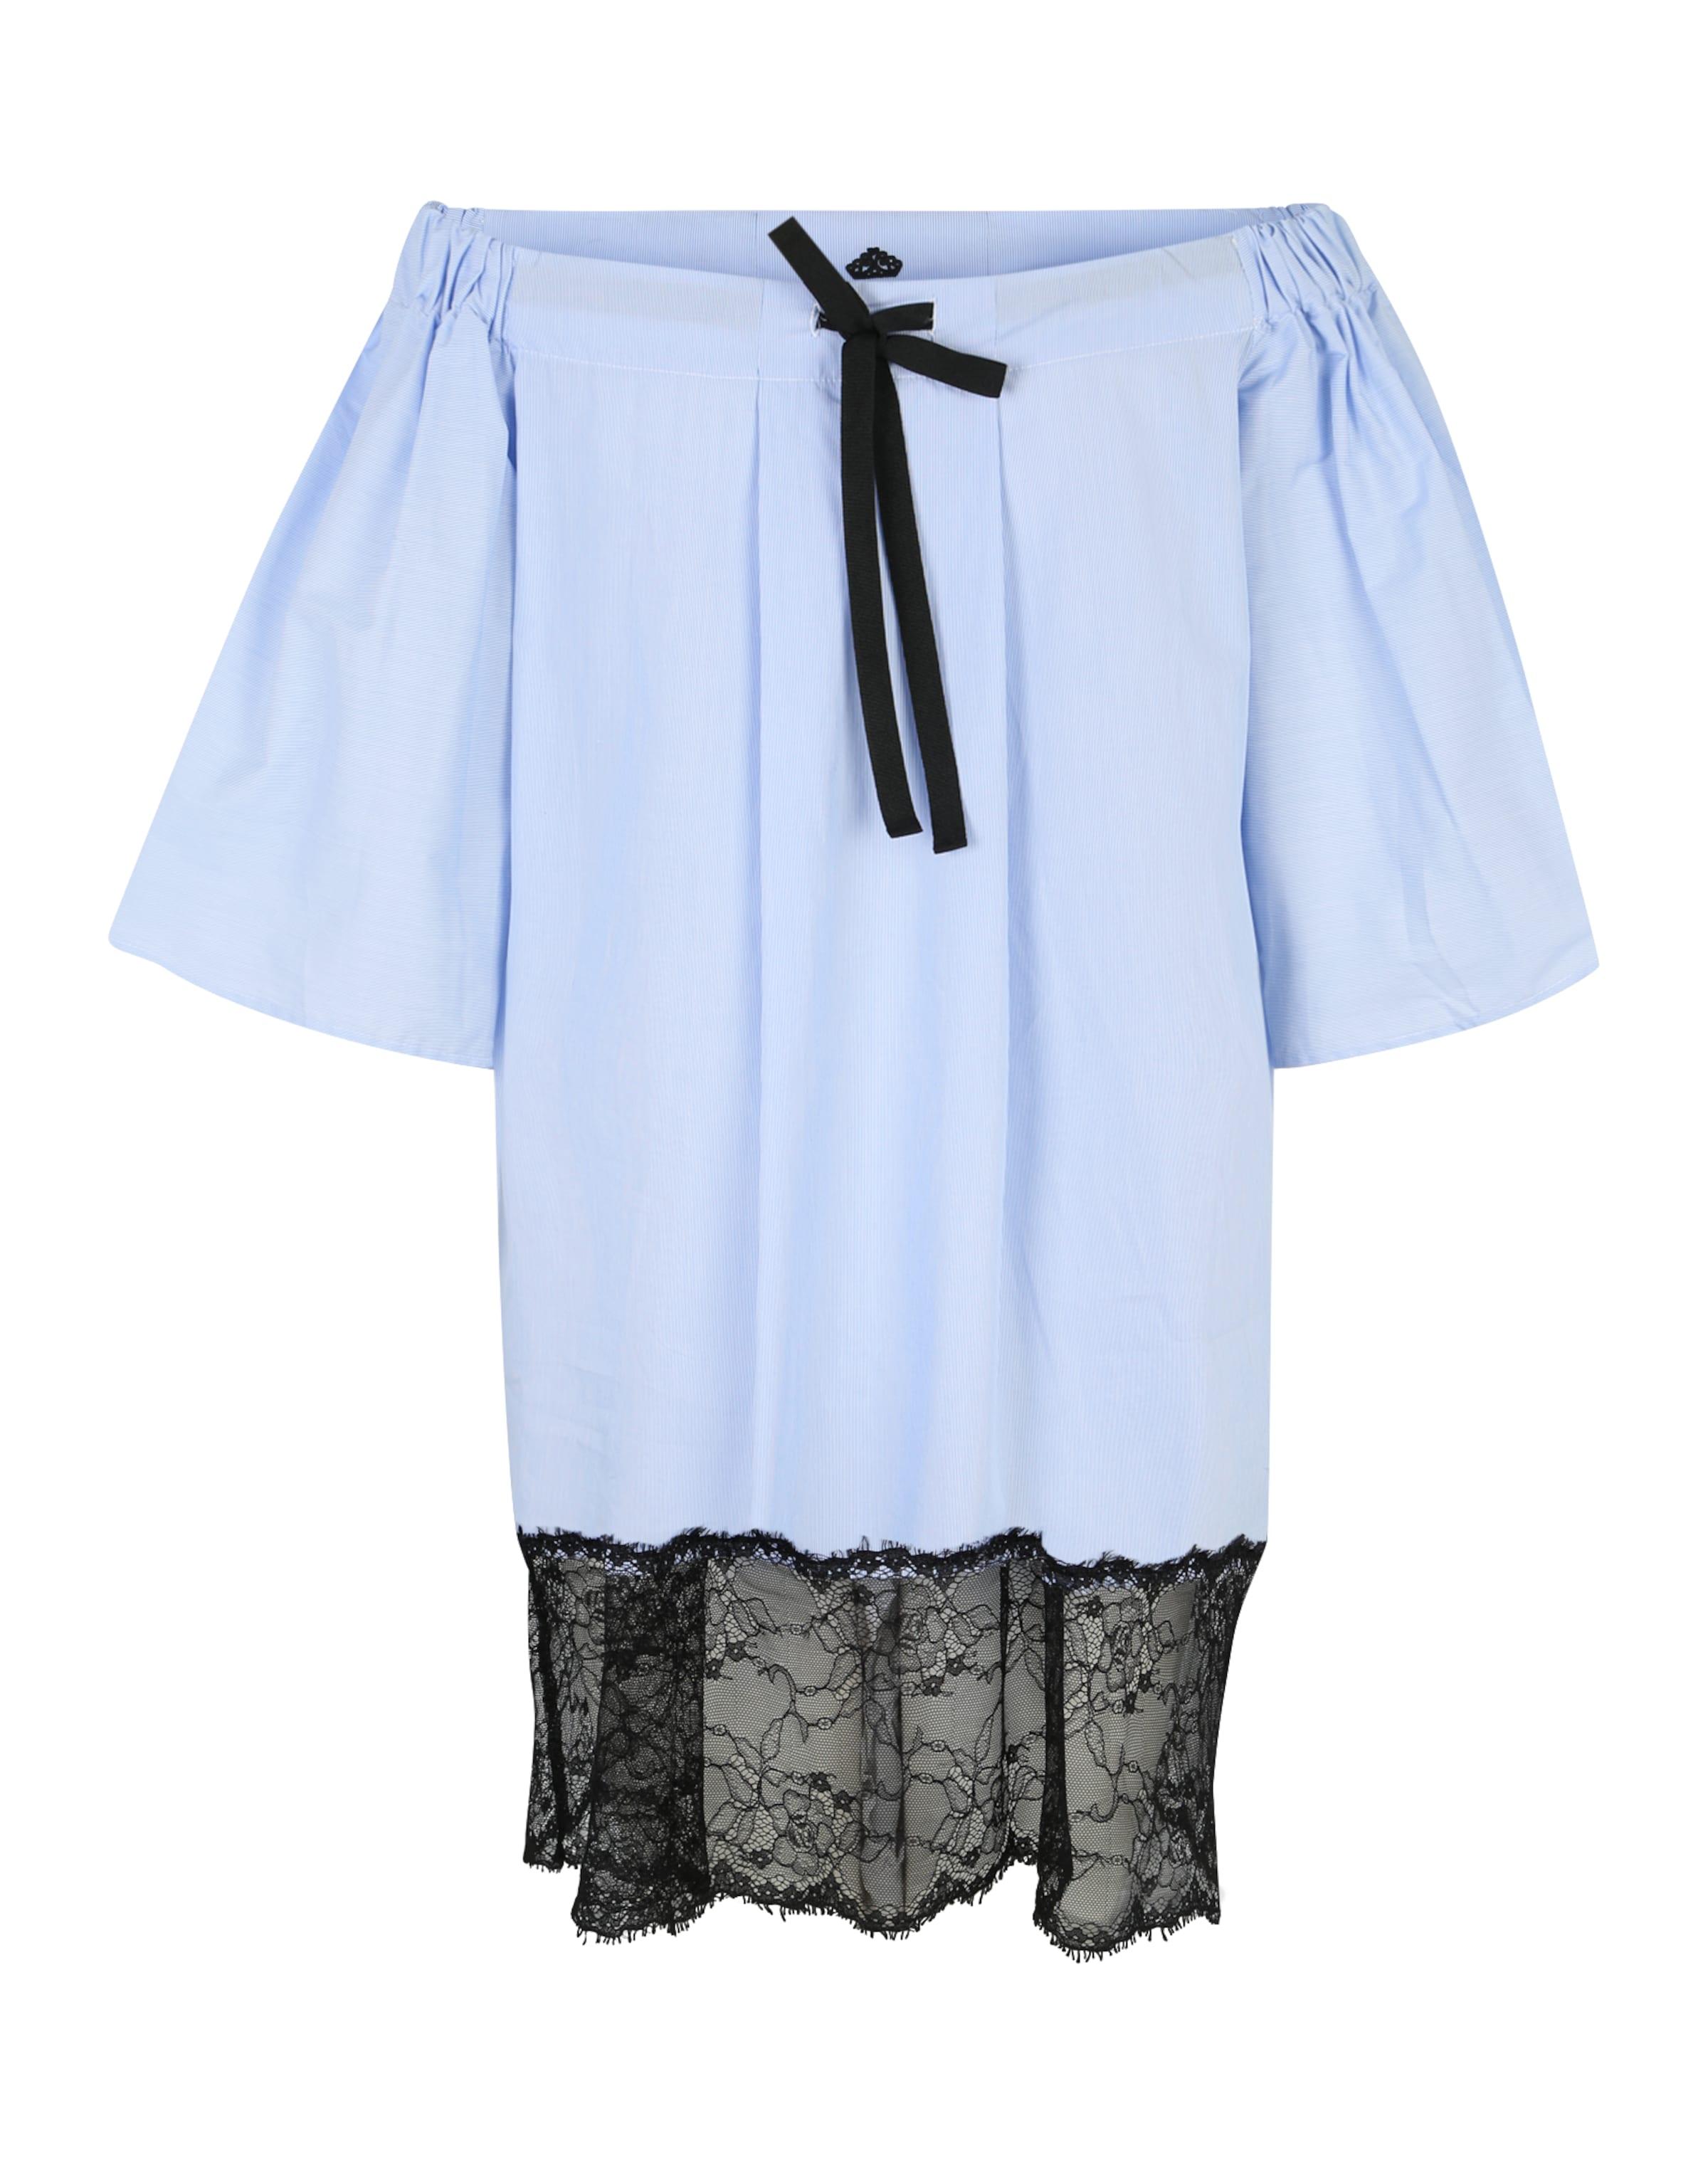 Fornarina Offshoulder-Kleid 'Violette' Kaufen Billig Zu Kaufen Billig Verkaufen Die Billigsten Verkaufsangebote ryMEd0WKk